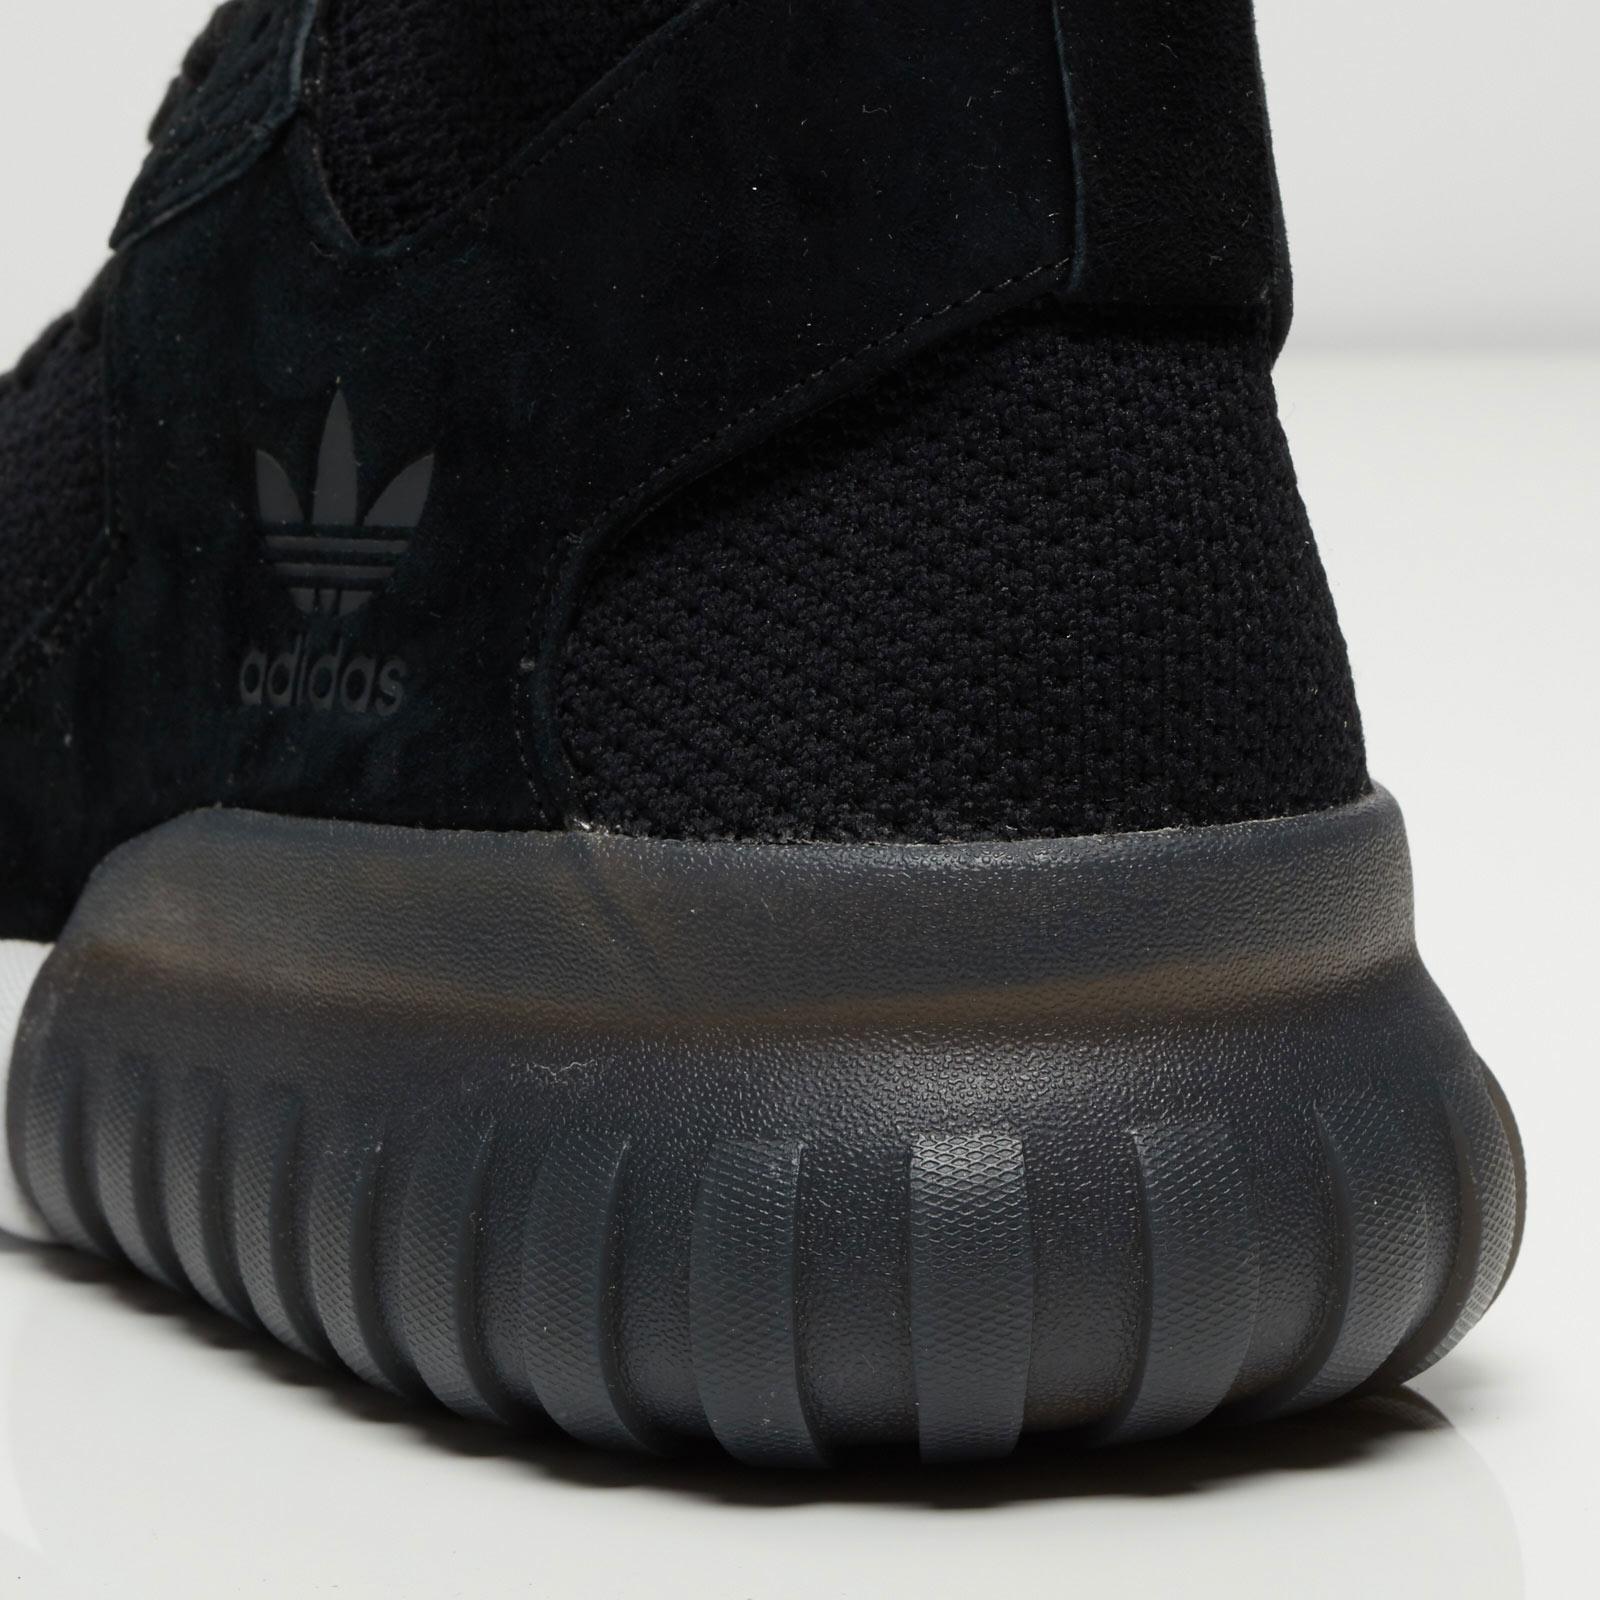 super popular ca955 c2939 adidas Tubular X Primeknit - S80128 - Sneakersnstuff ...